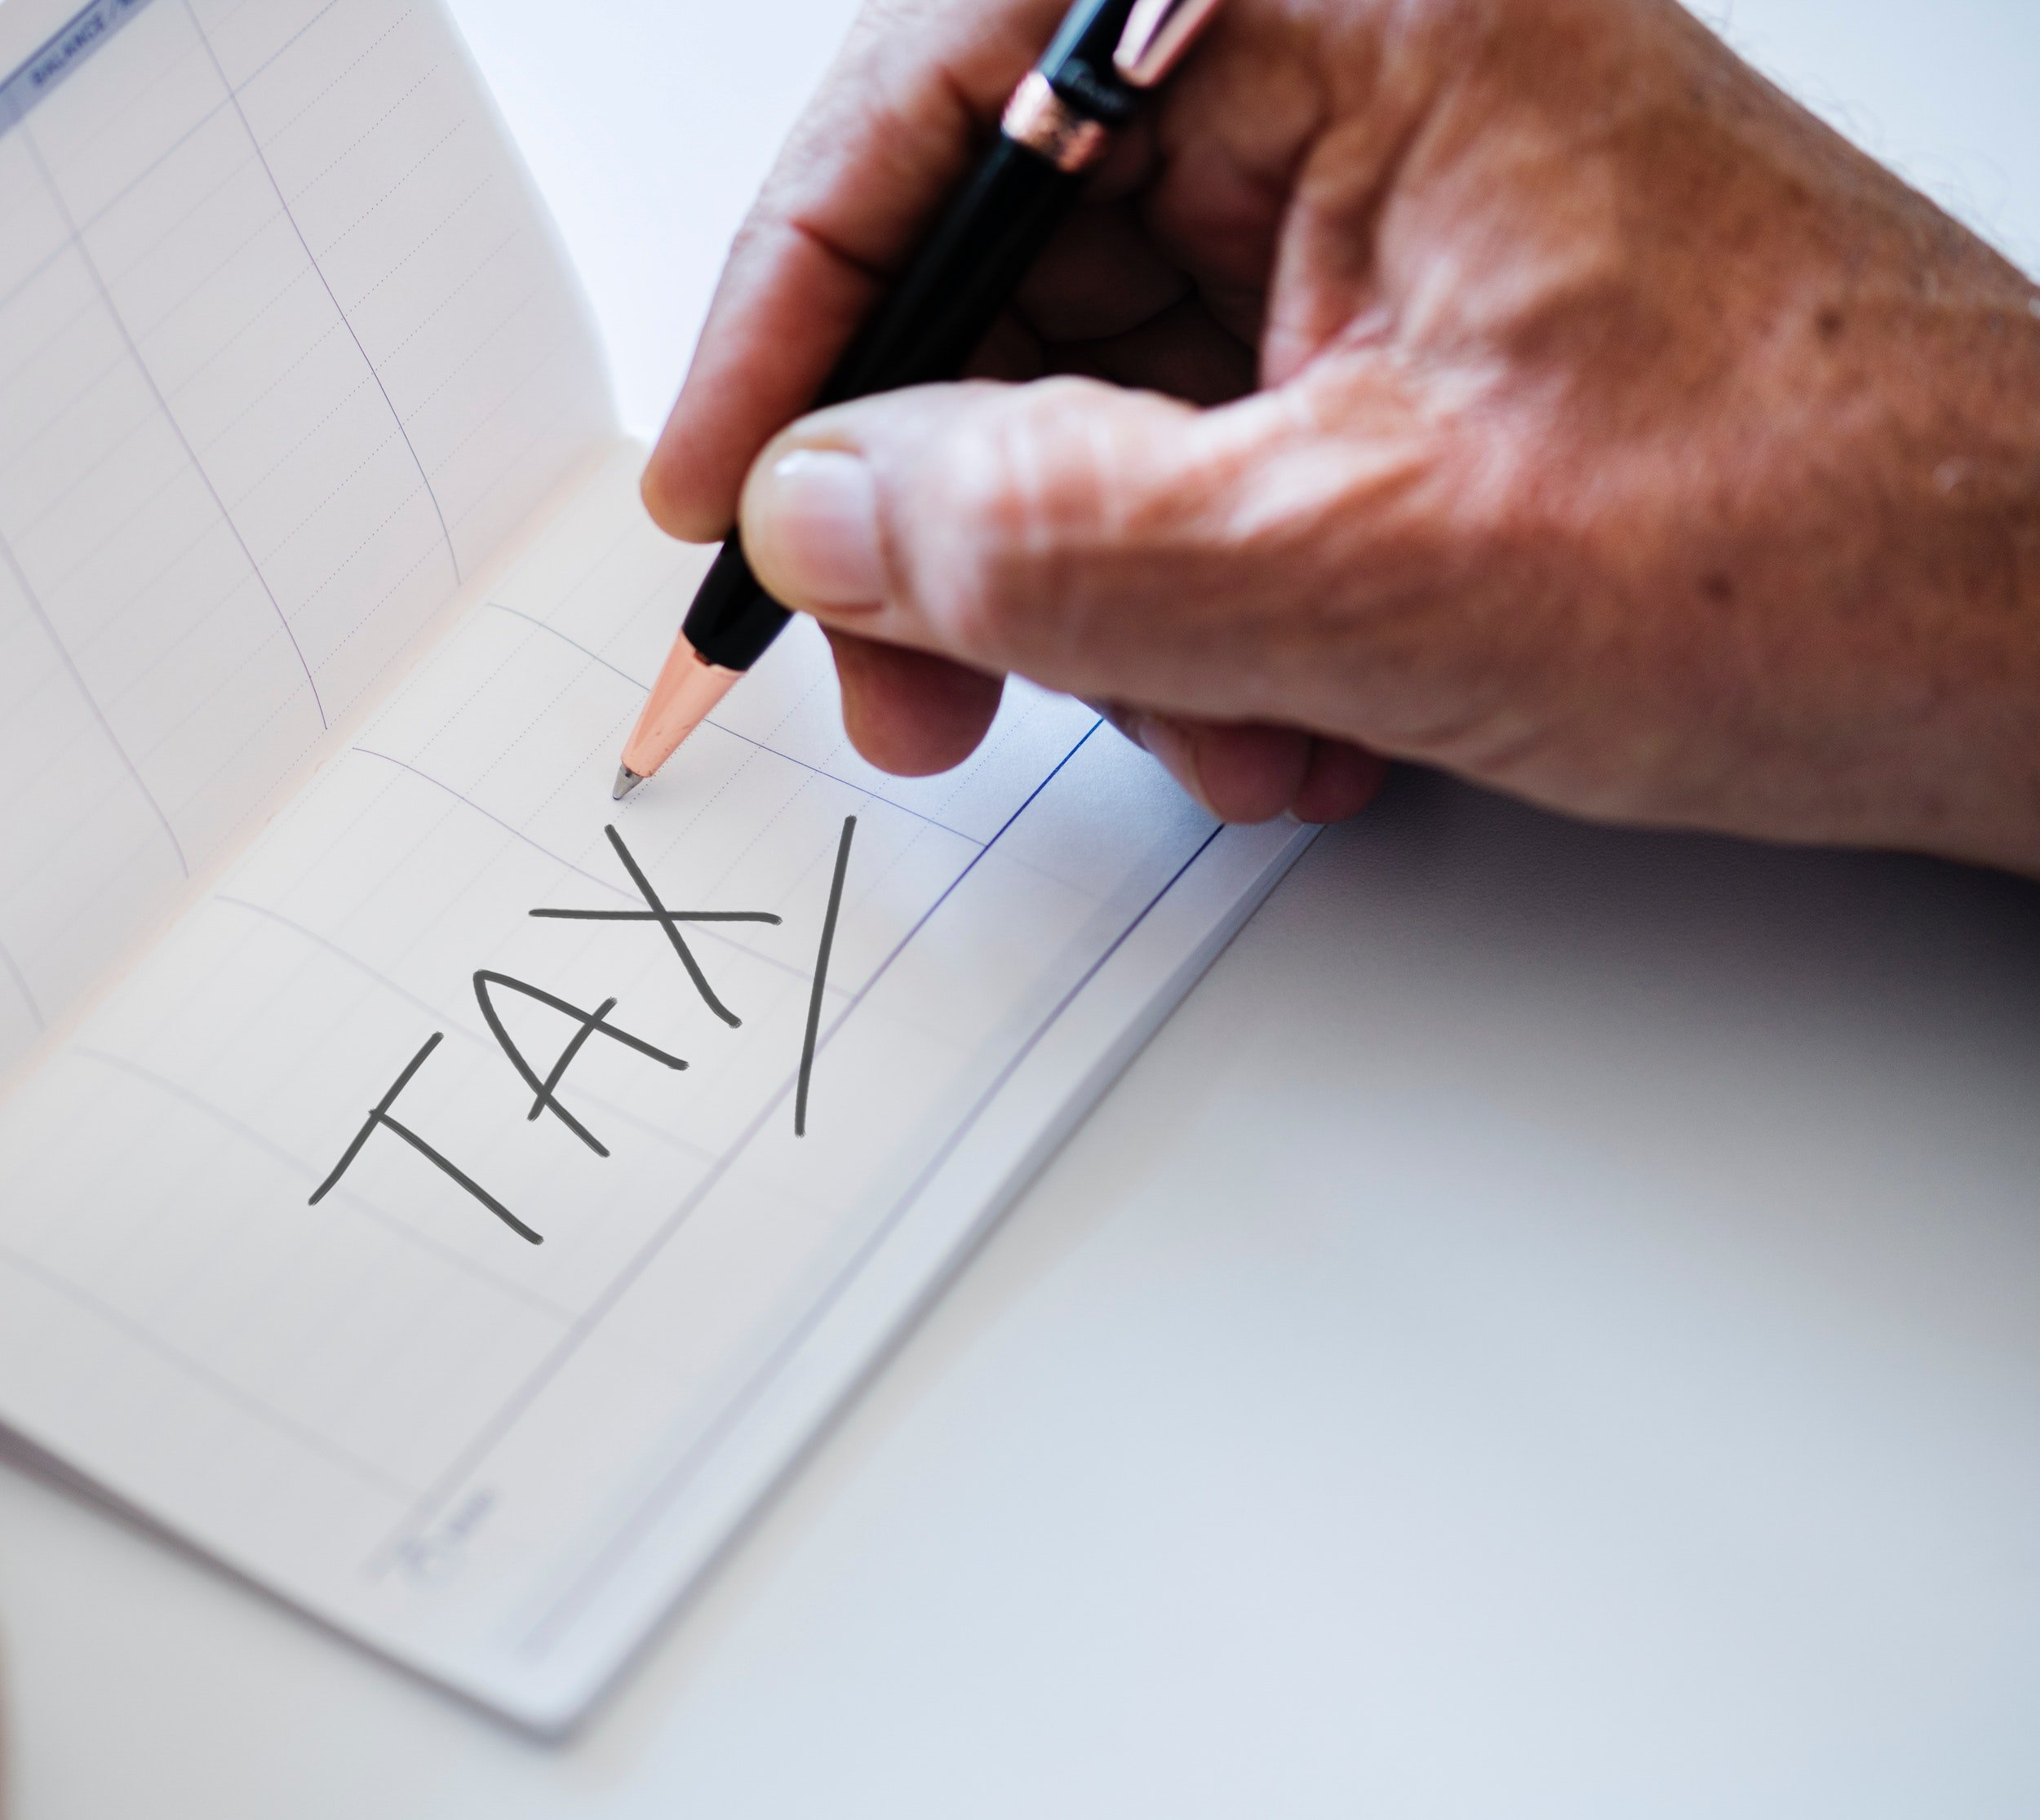 Steuern | Quelle: Pexels